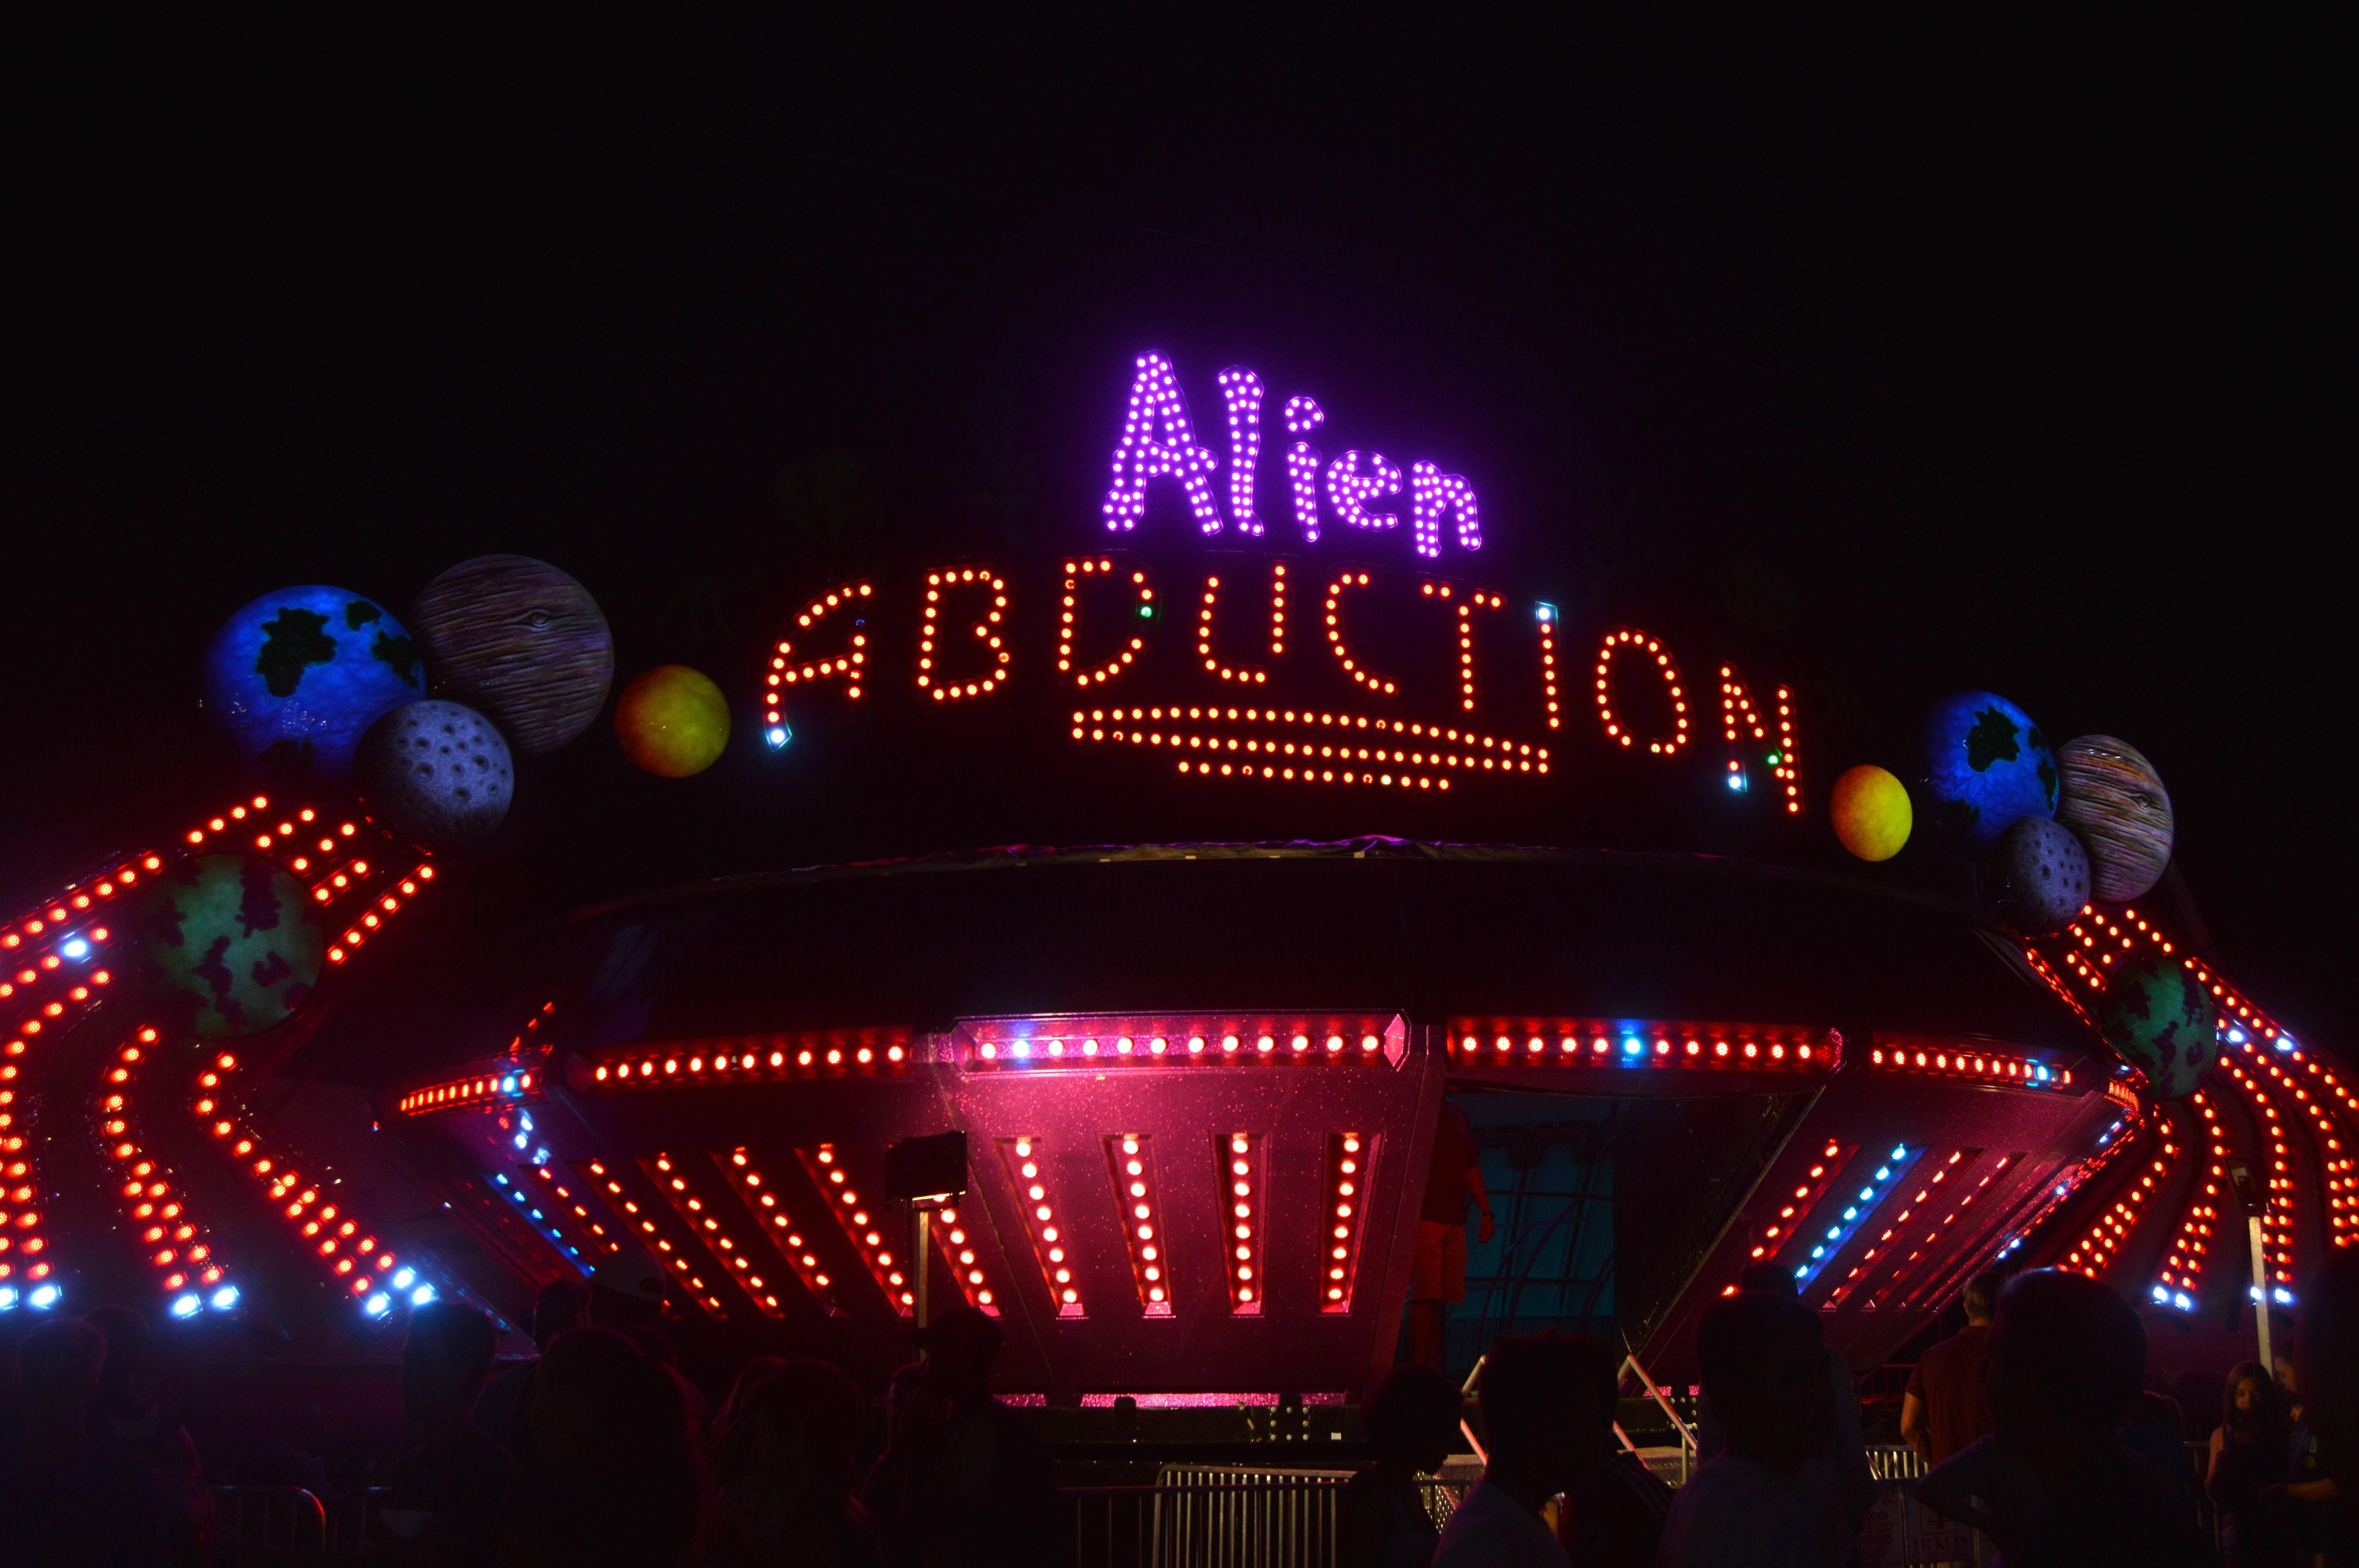 4f83b89dcb935d978b2d_SBA_Alien_Abduction.JPG